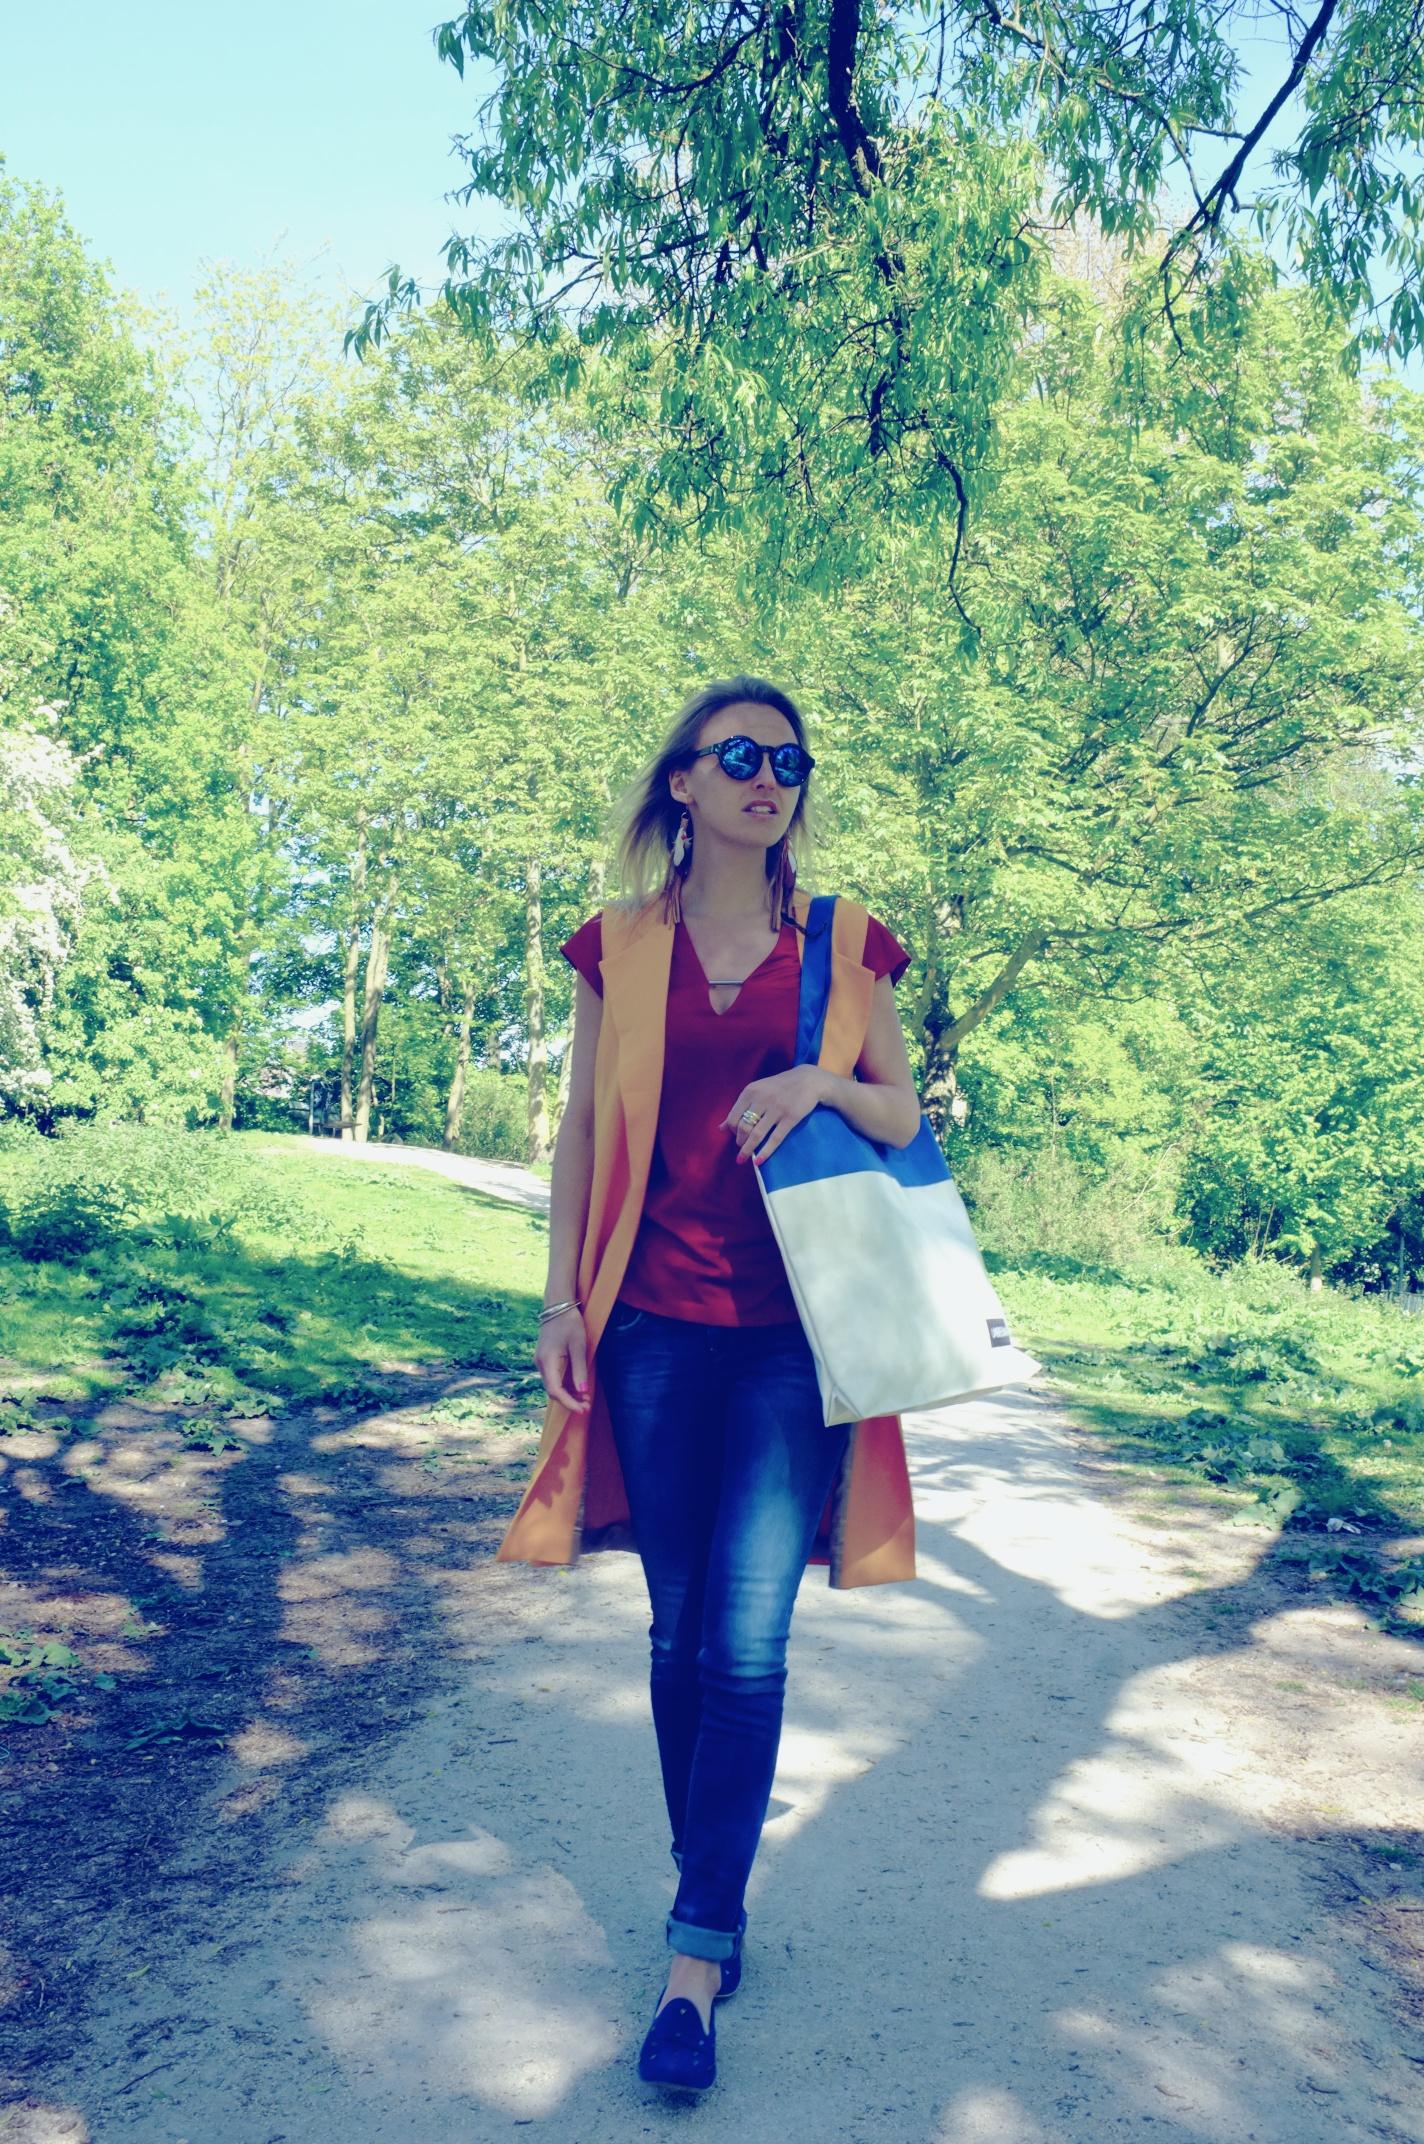 BagAtYou - Fashion Blog - Unbegun Bags - Tassen 6 - Streetstyle